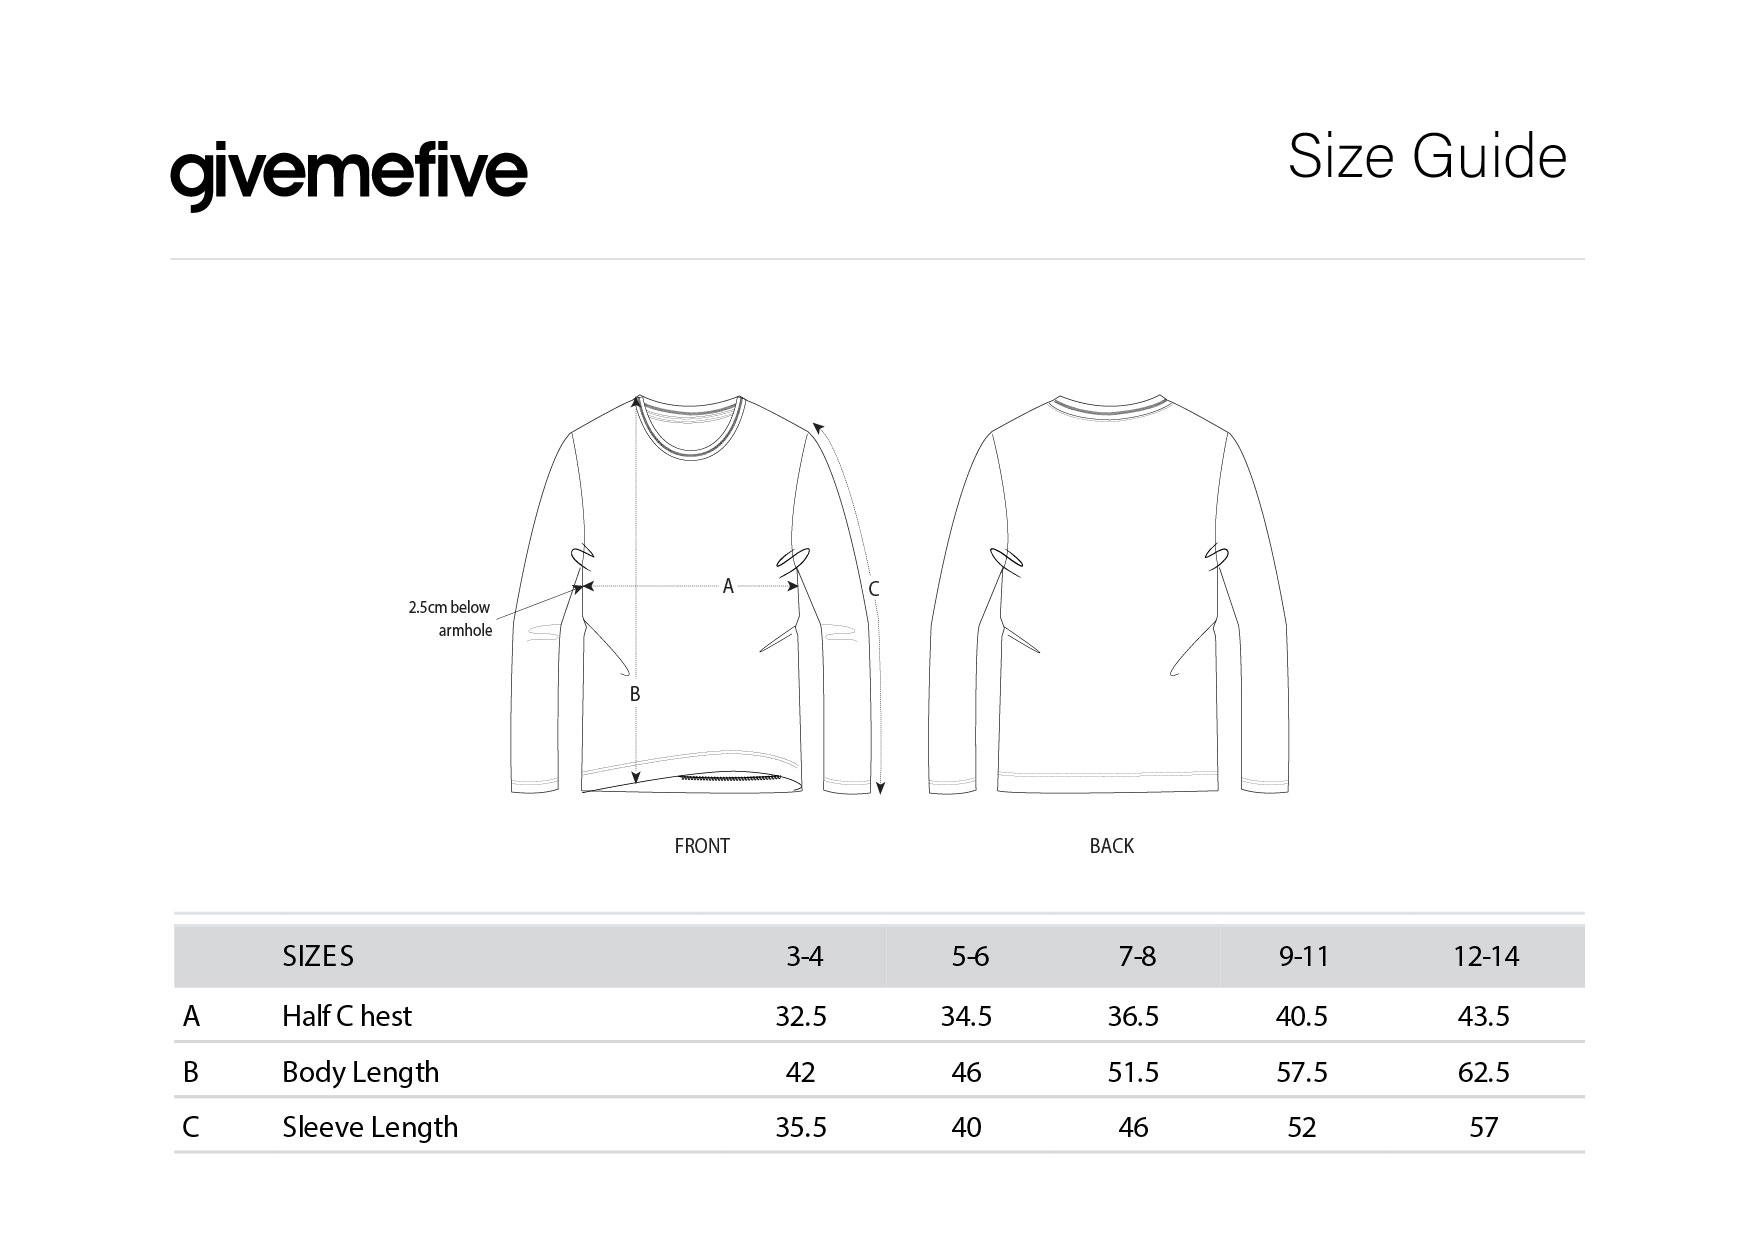 givemefive_taille_enfant_t-shirt_ml